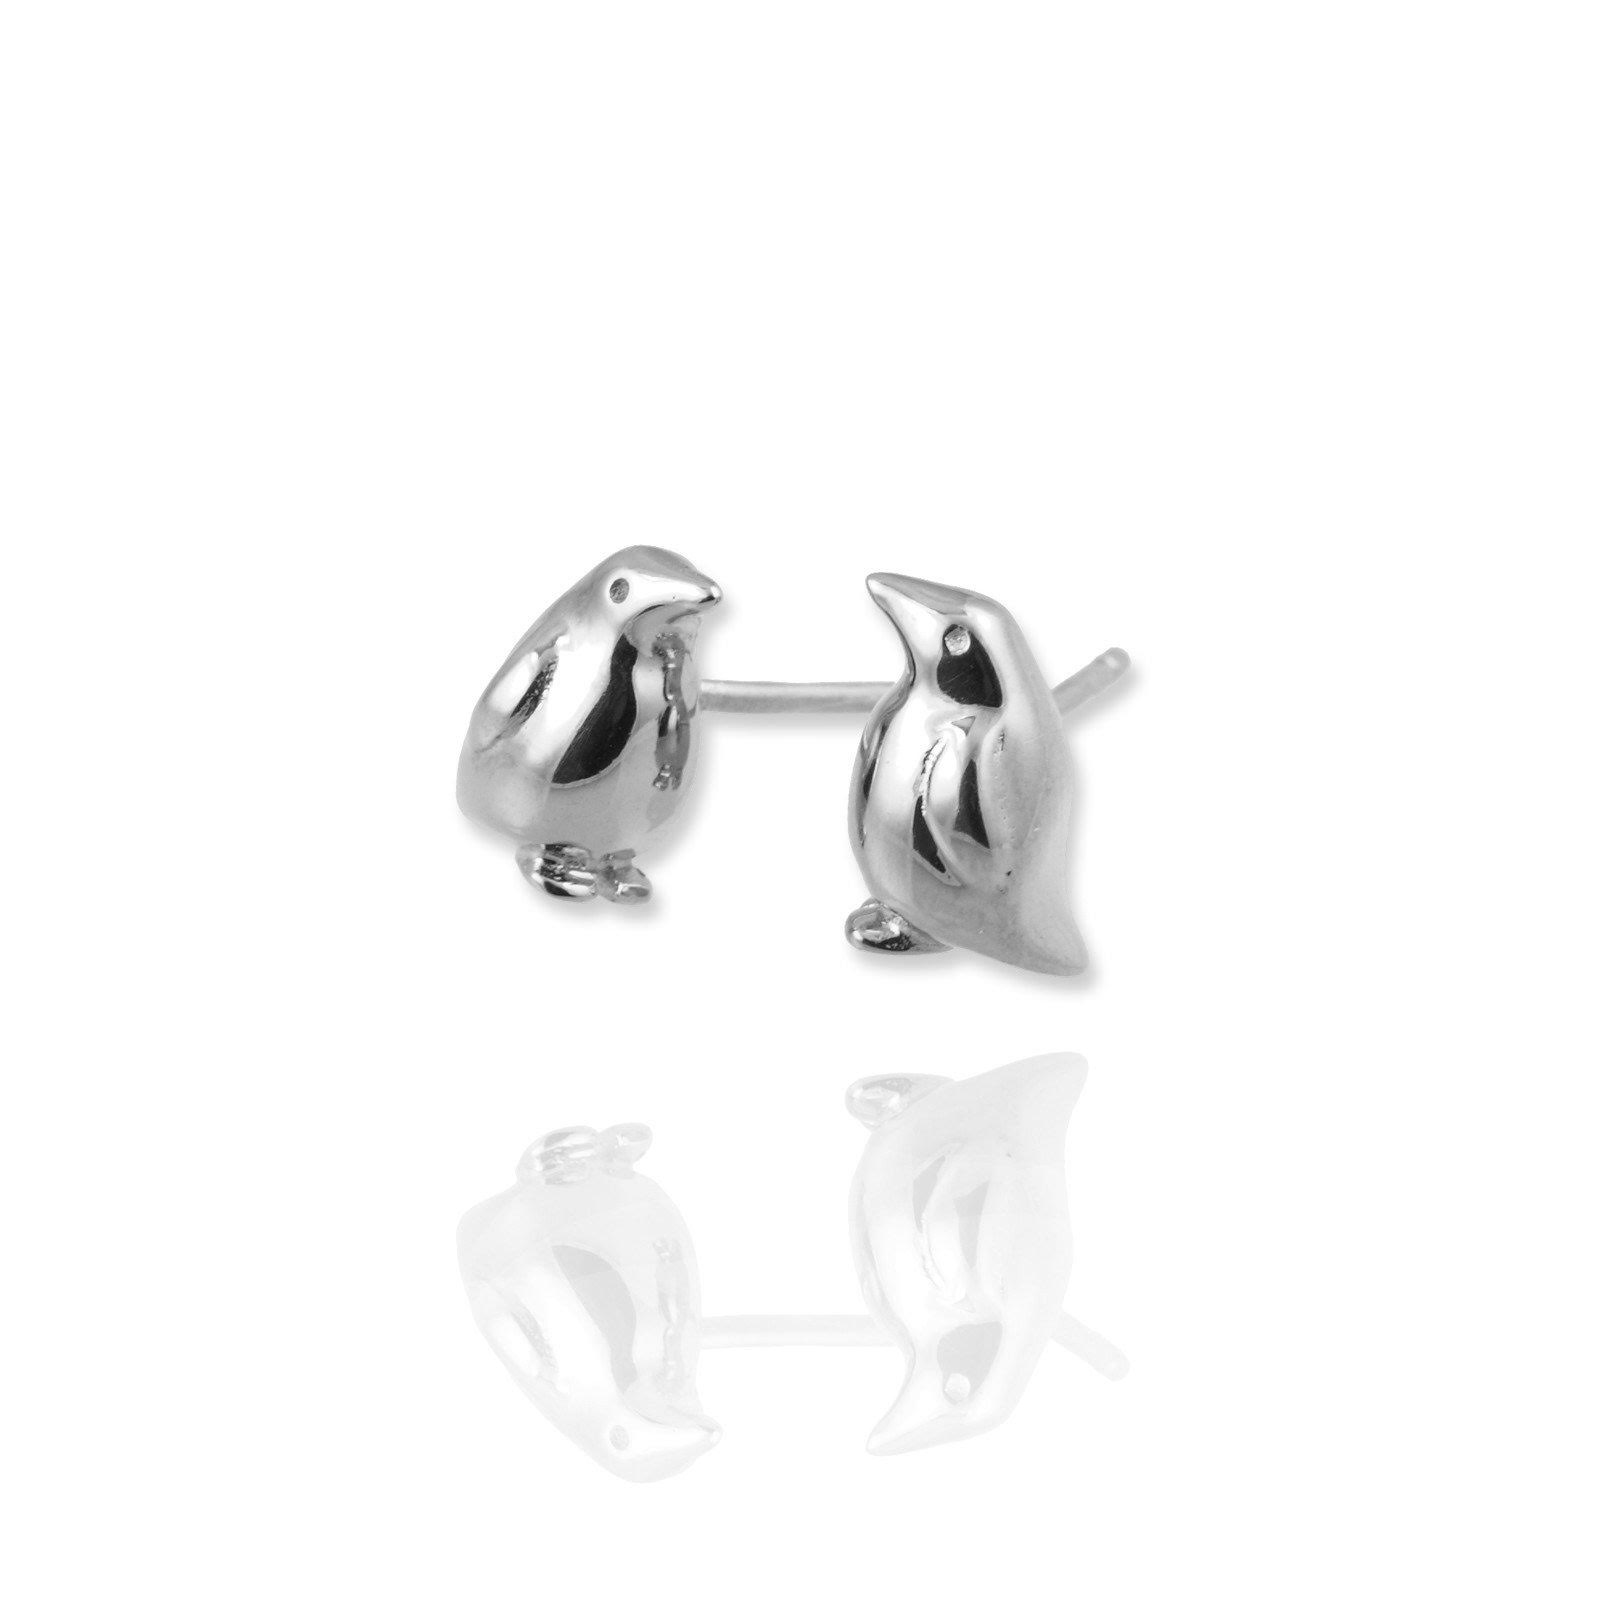 penguin earrings close up